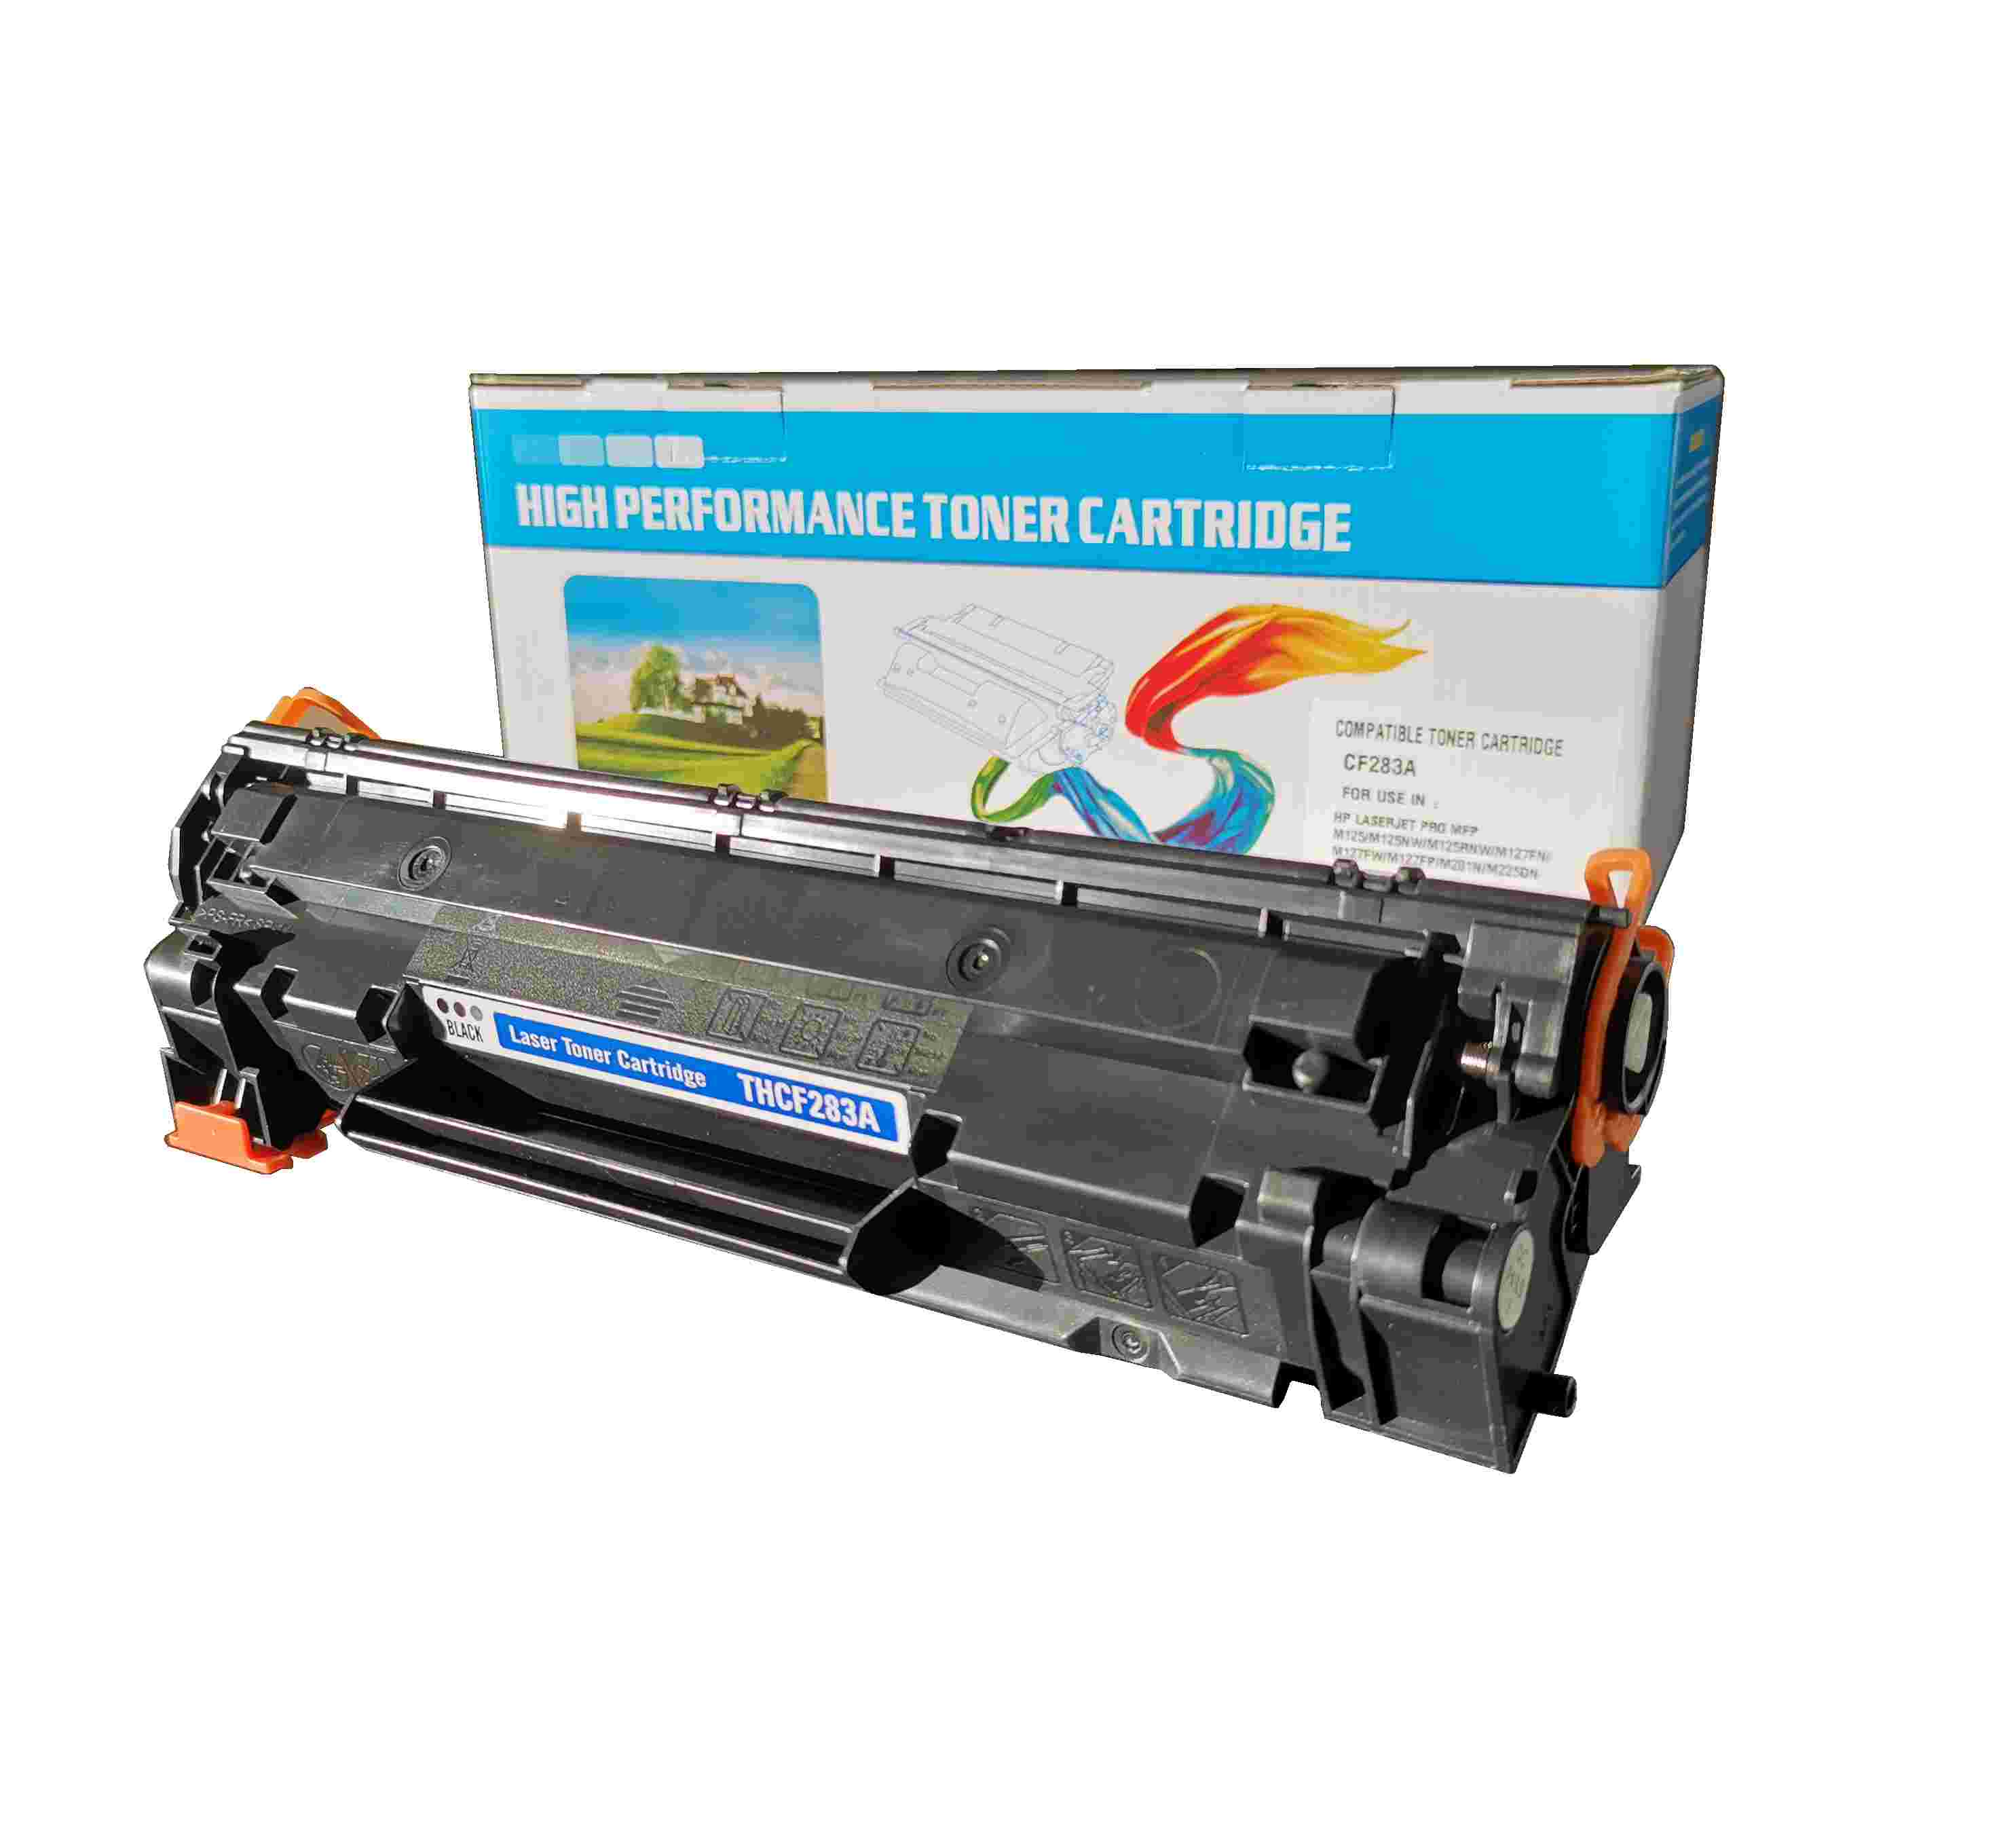 20 Pack CF283A 83A Toner Cartridge For HP LaserJet M125a M125rnw M127fw M127fn